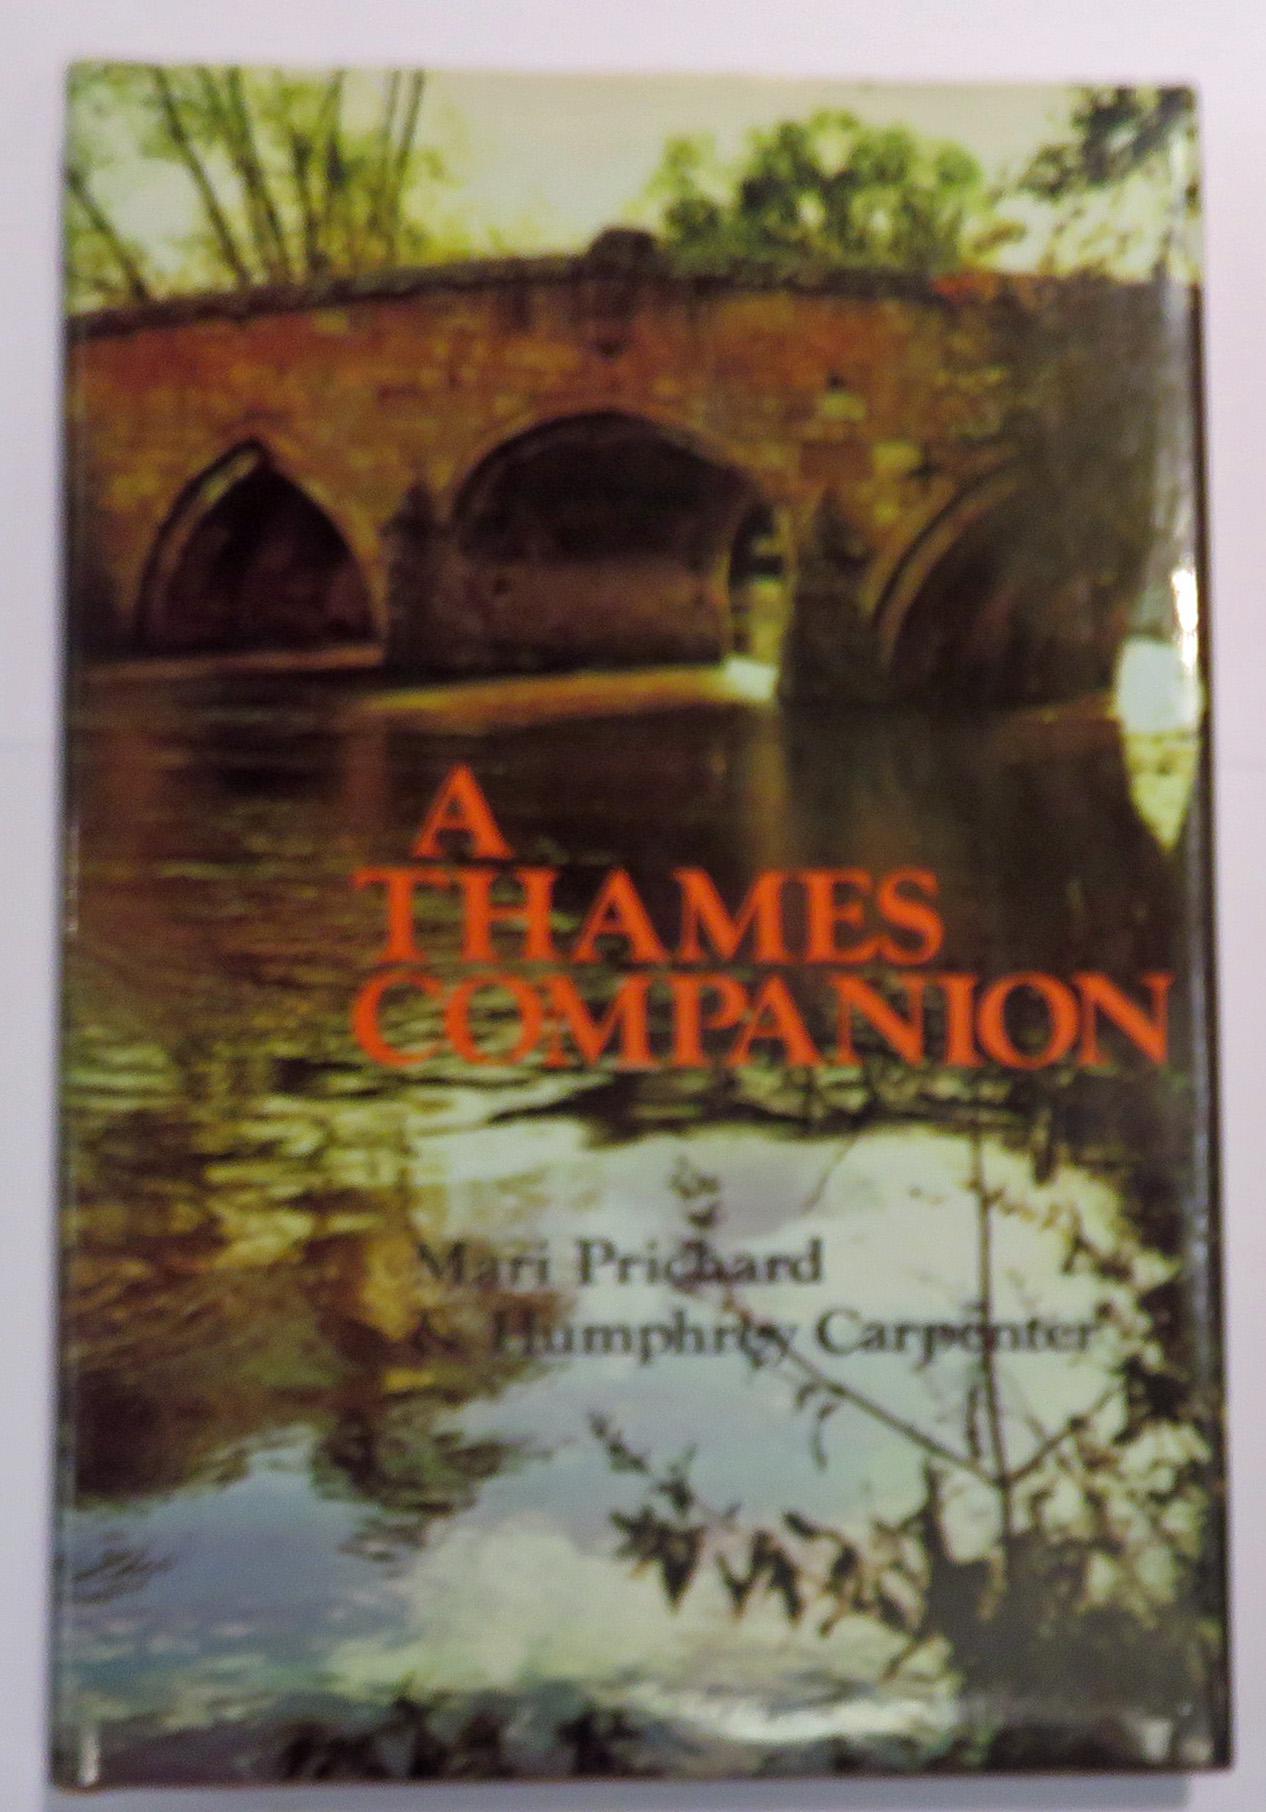 A Thames Companion